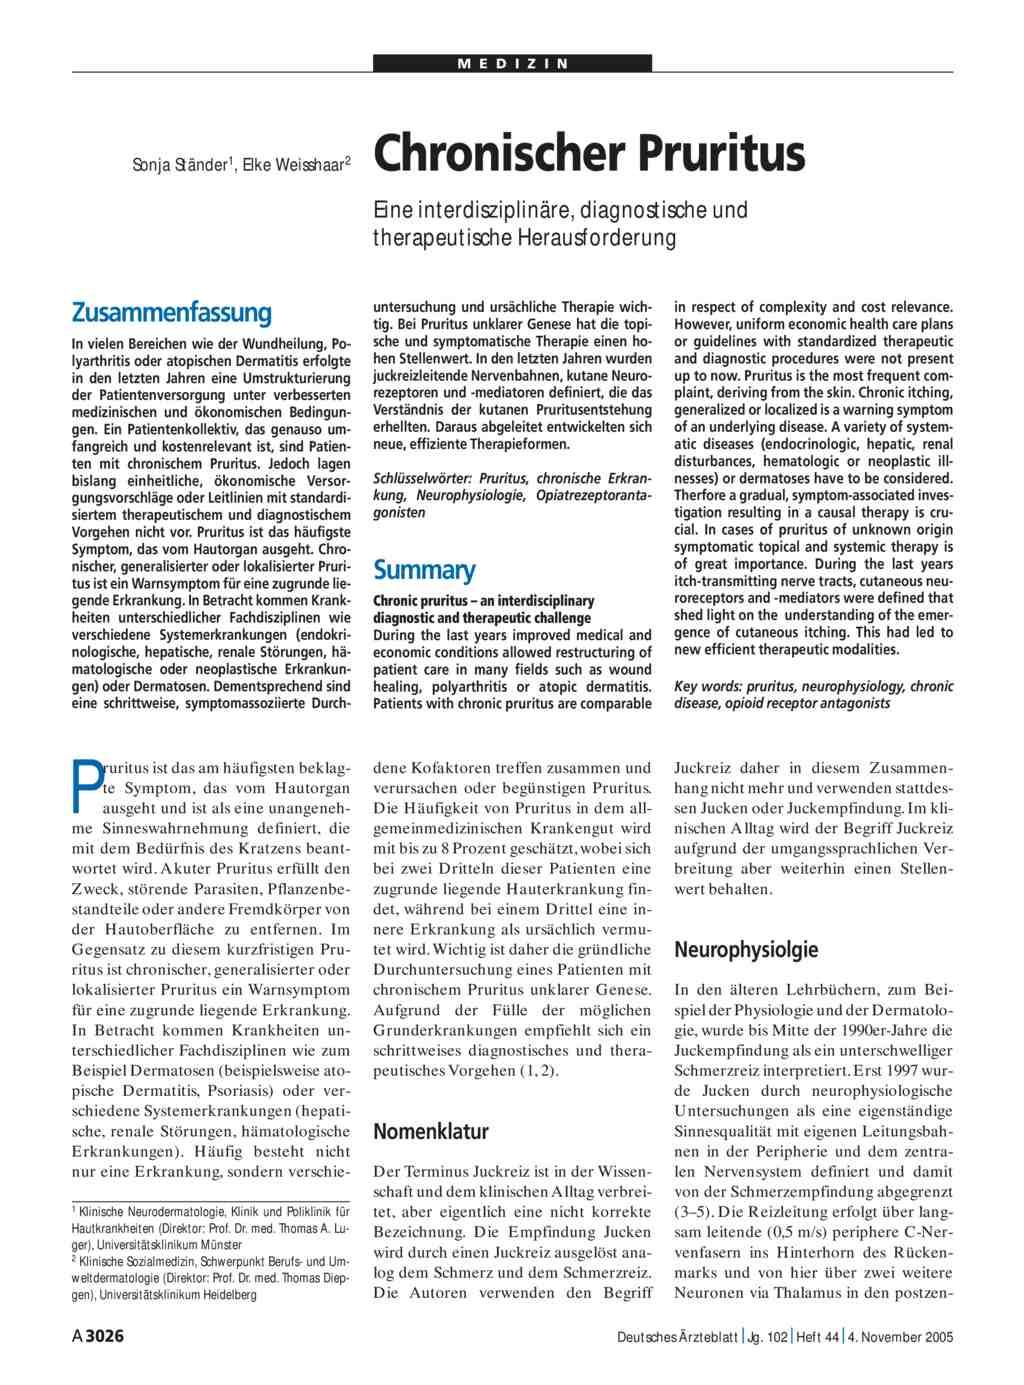 diagnosi di prostatite chronische bakterielle